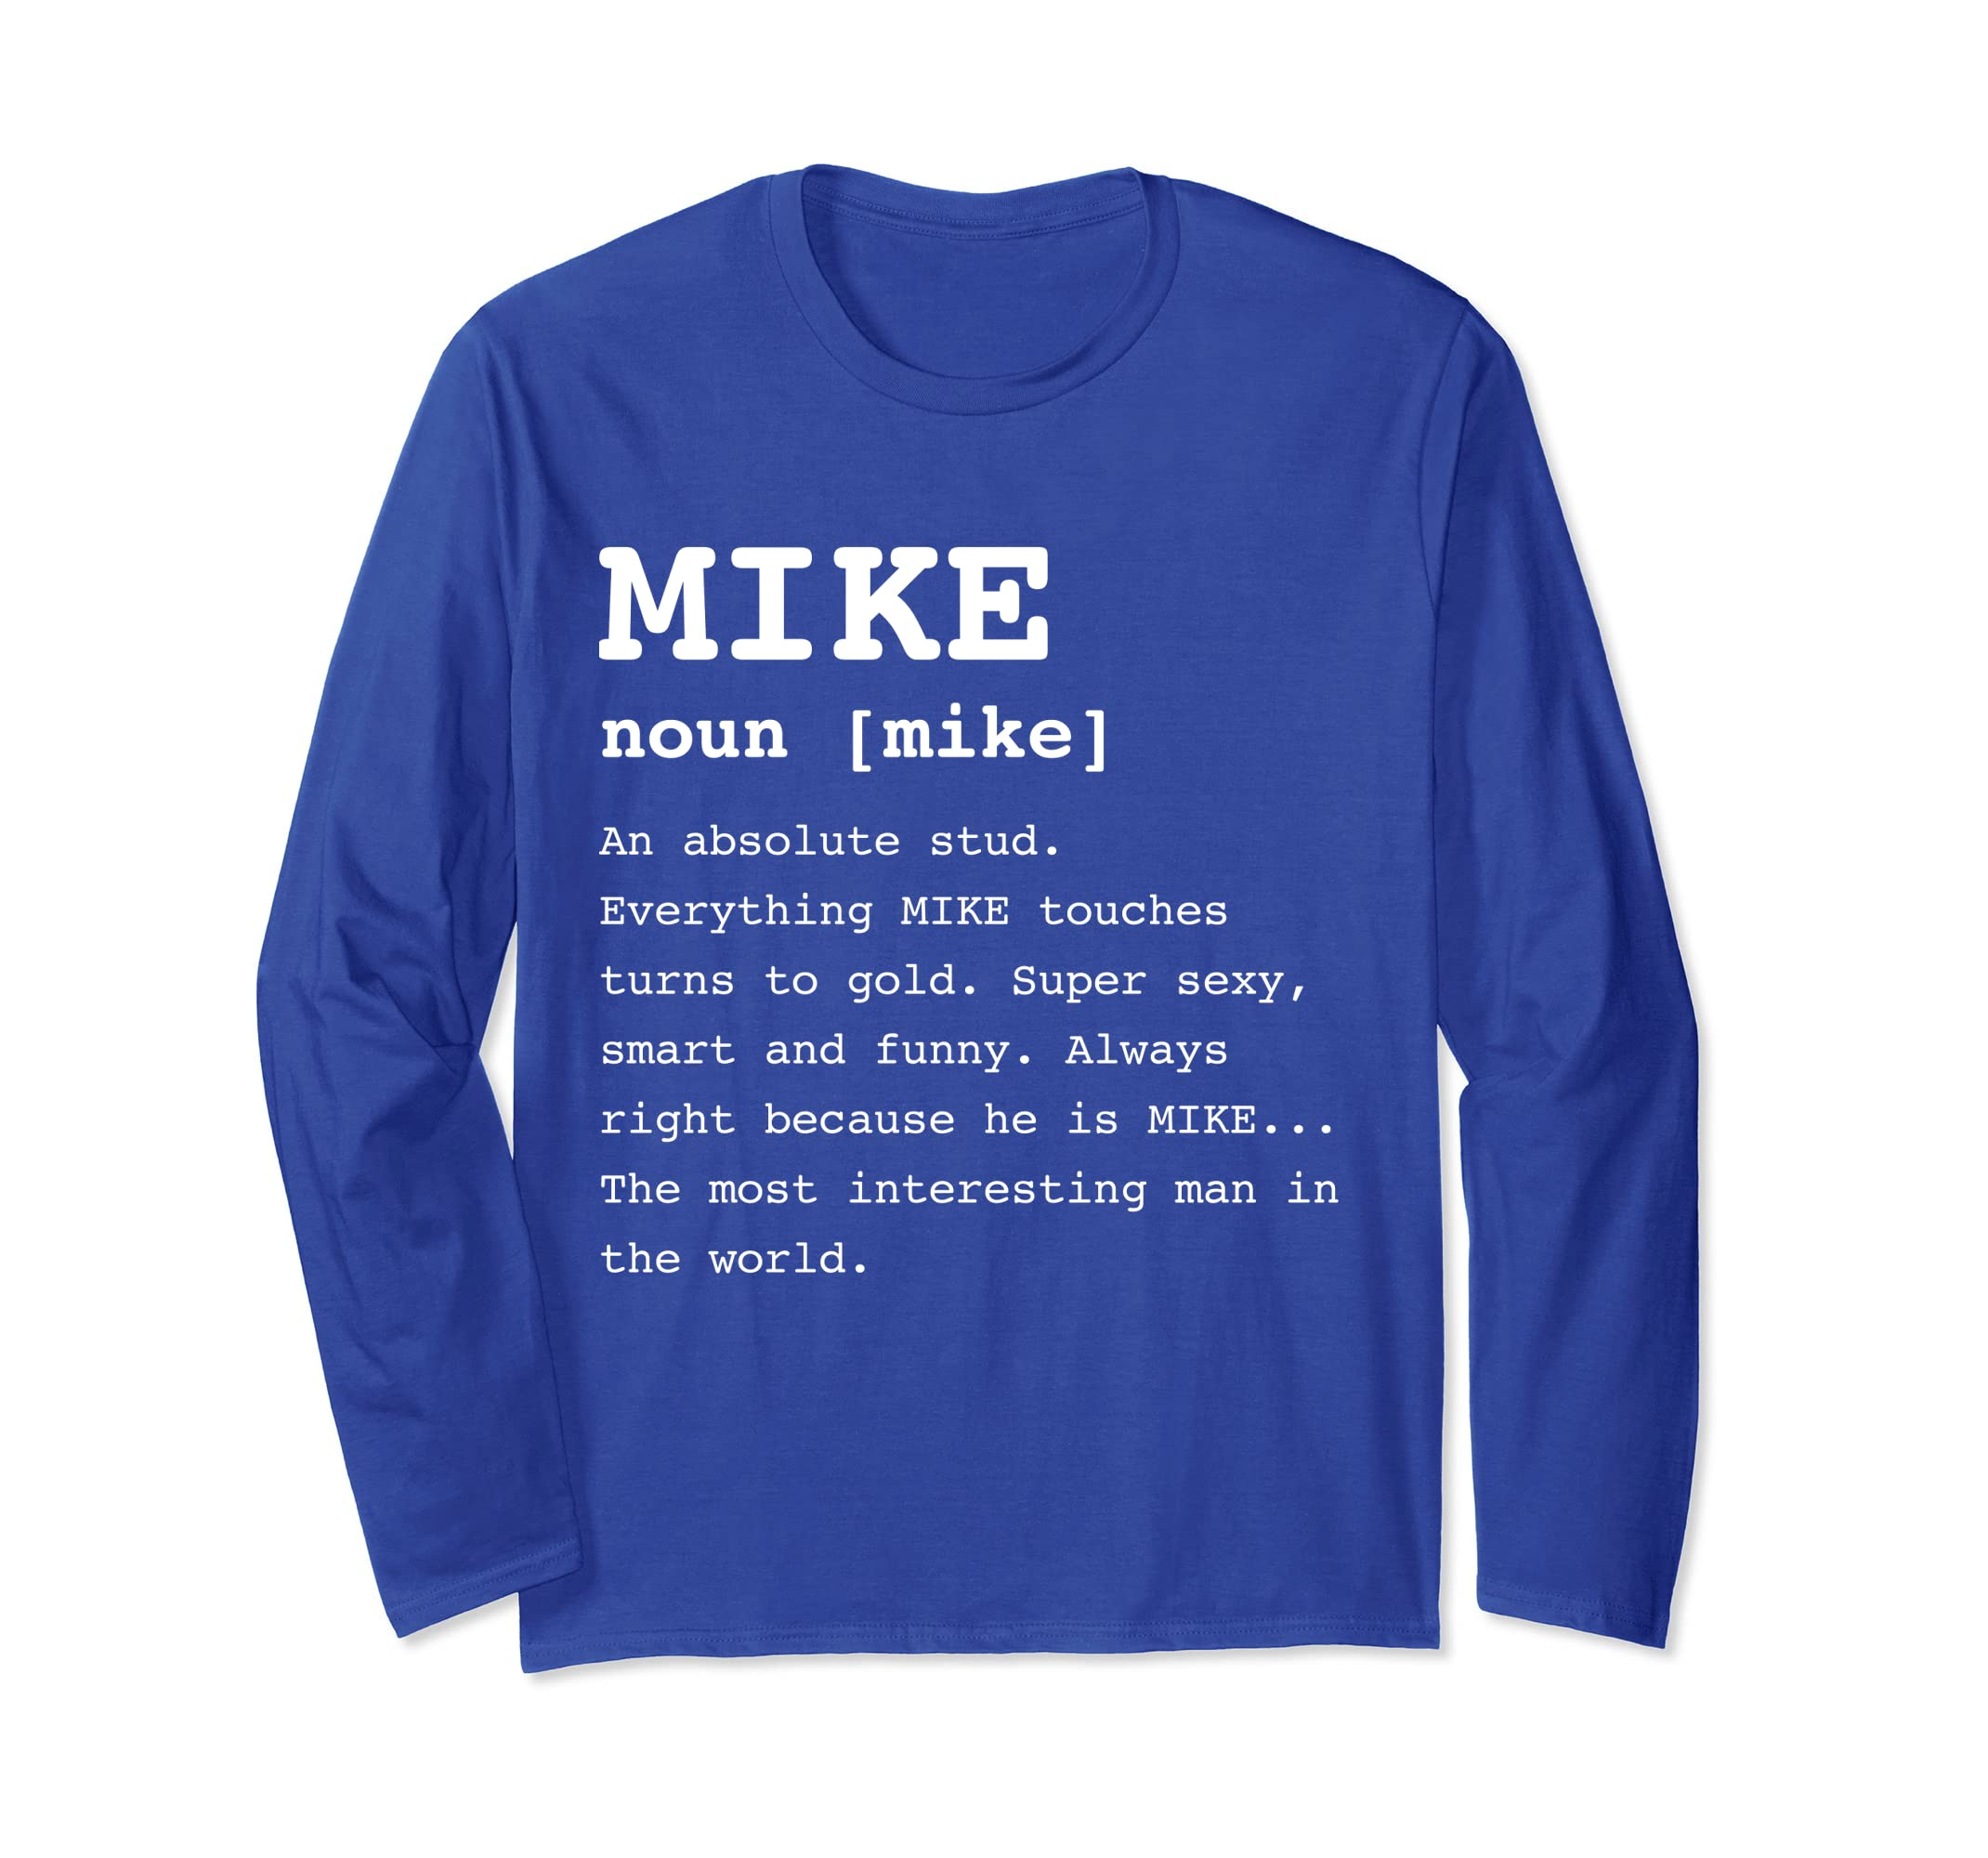 b217d094 Amazon.com: Mike Long Sleeve Shirt for Men Gifts Winter Shirts: Clothing